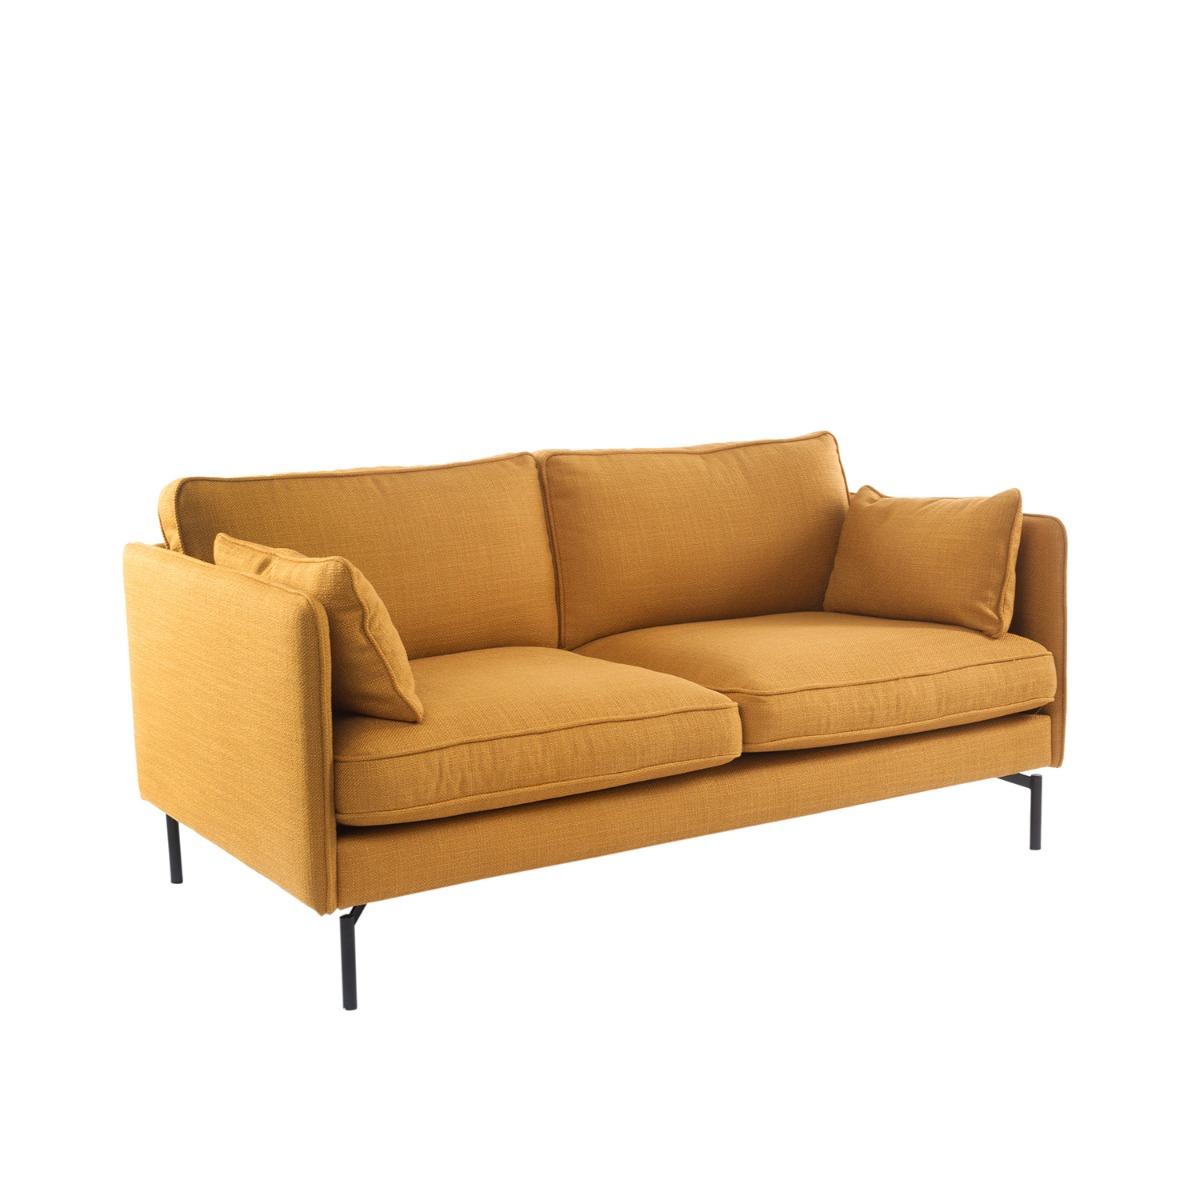 PPno.2 sofa Pols Potten Okergeel